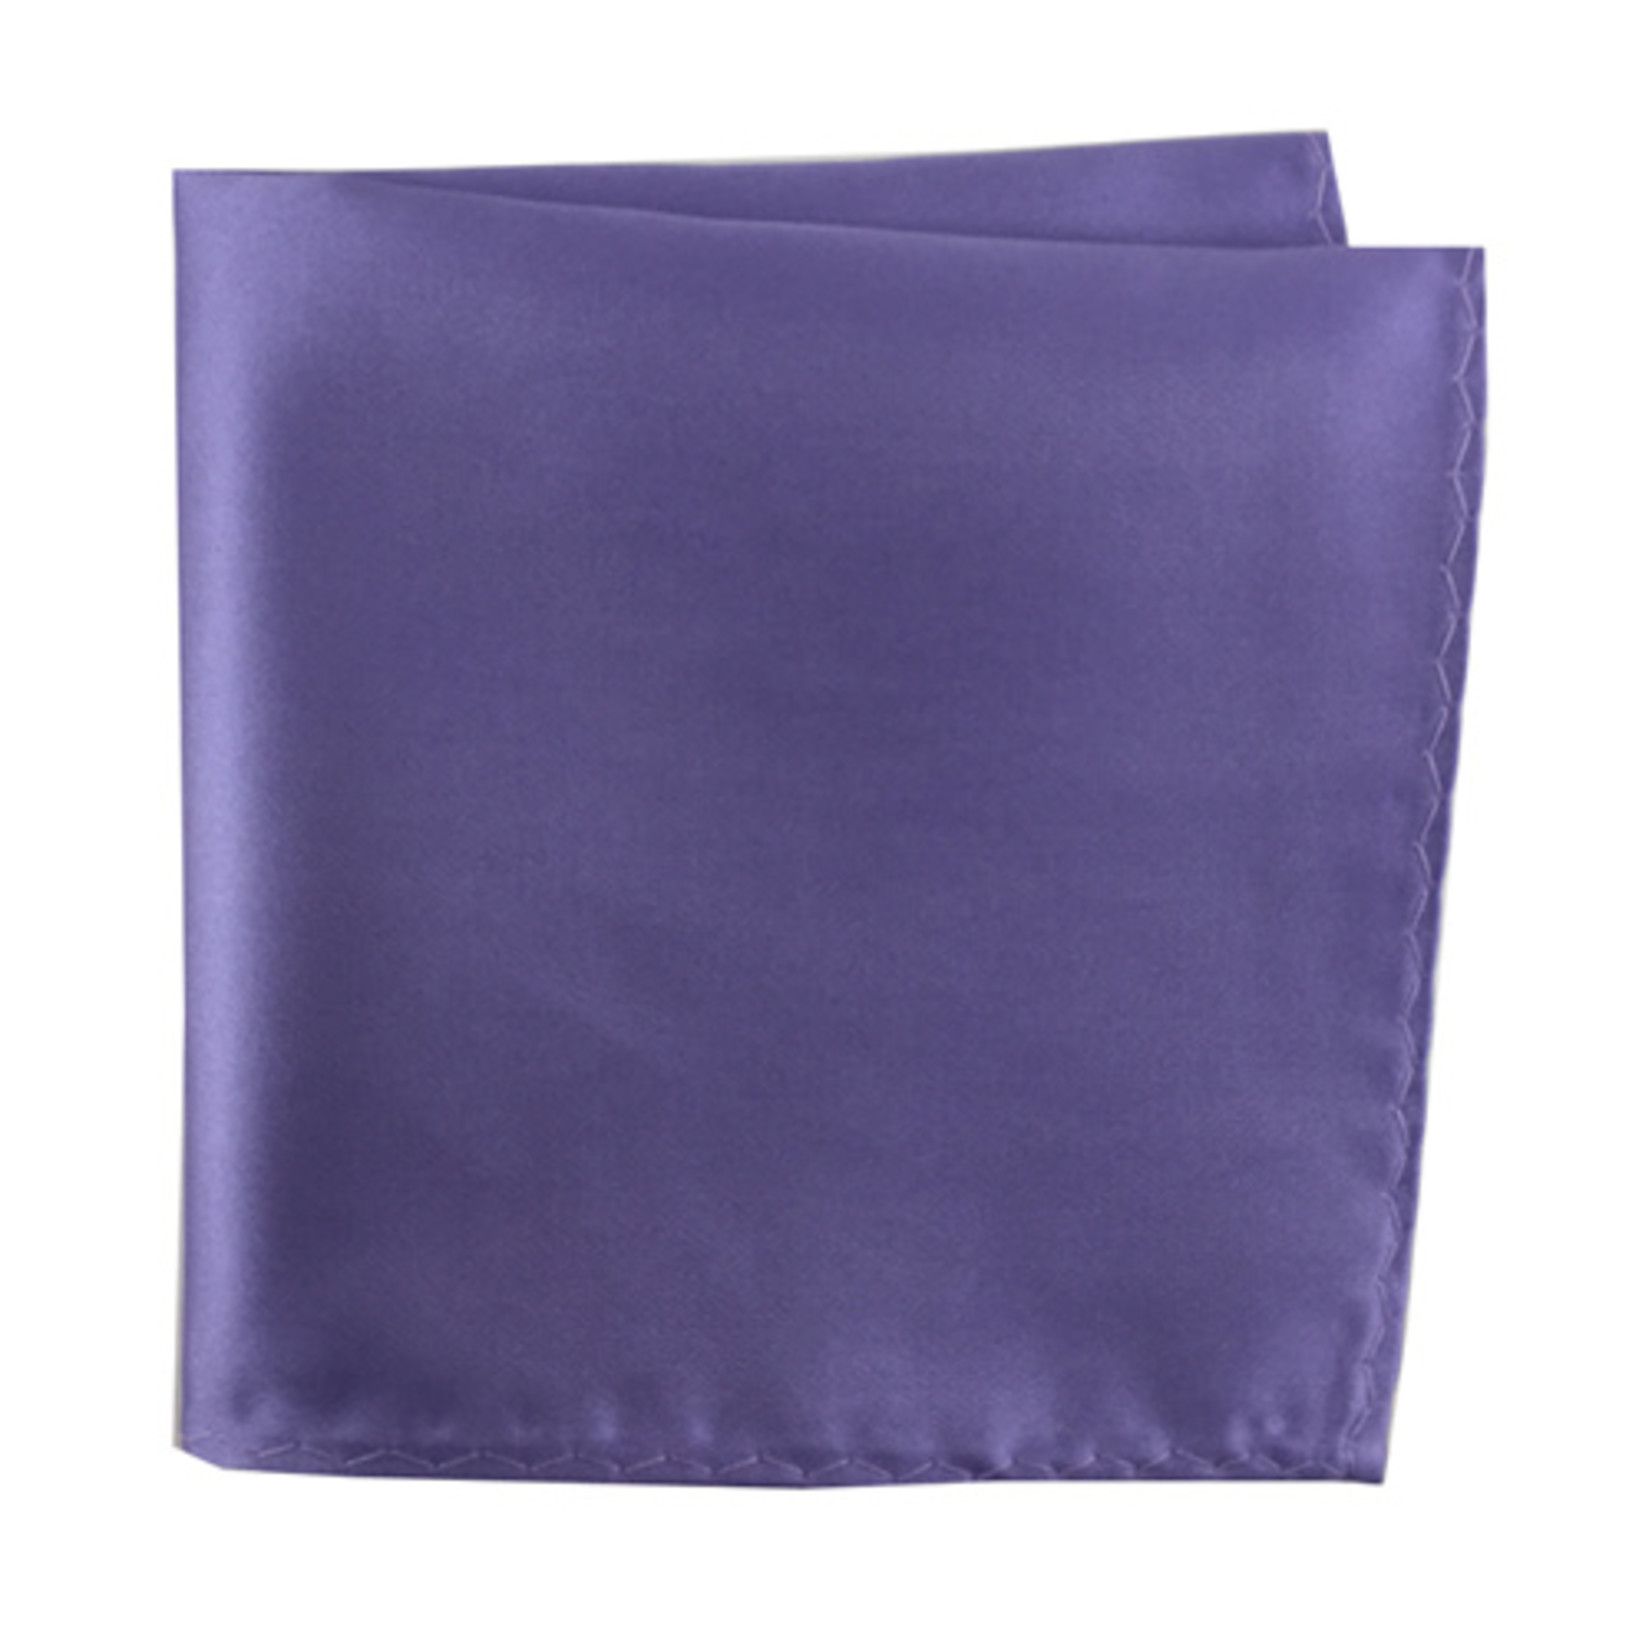 Knotz M100PSQ-13 Solid Lilac Pocket Square